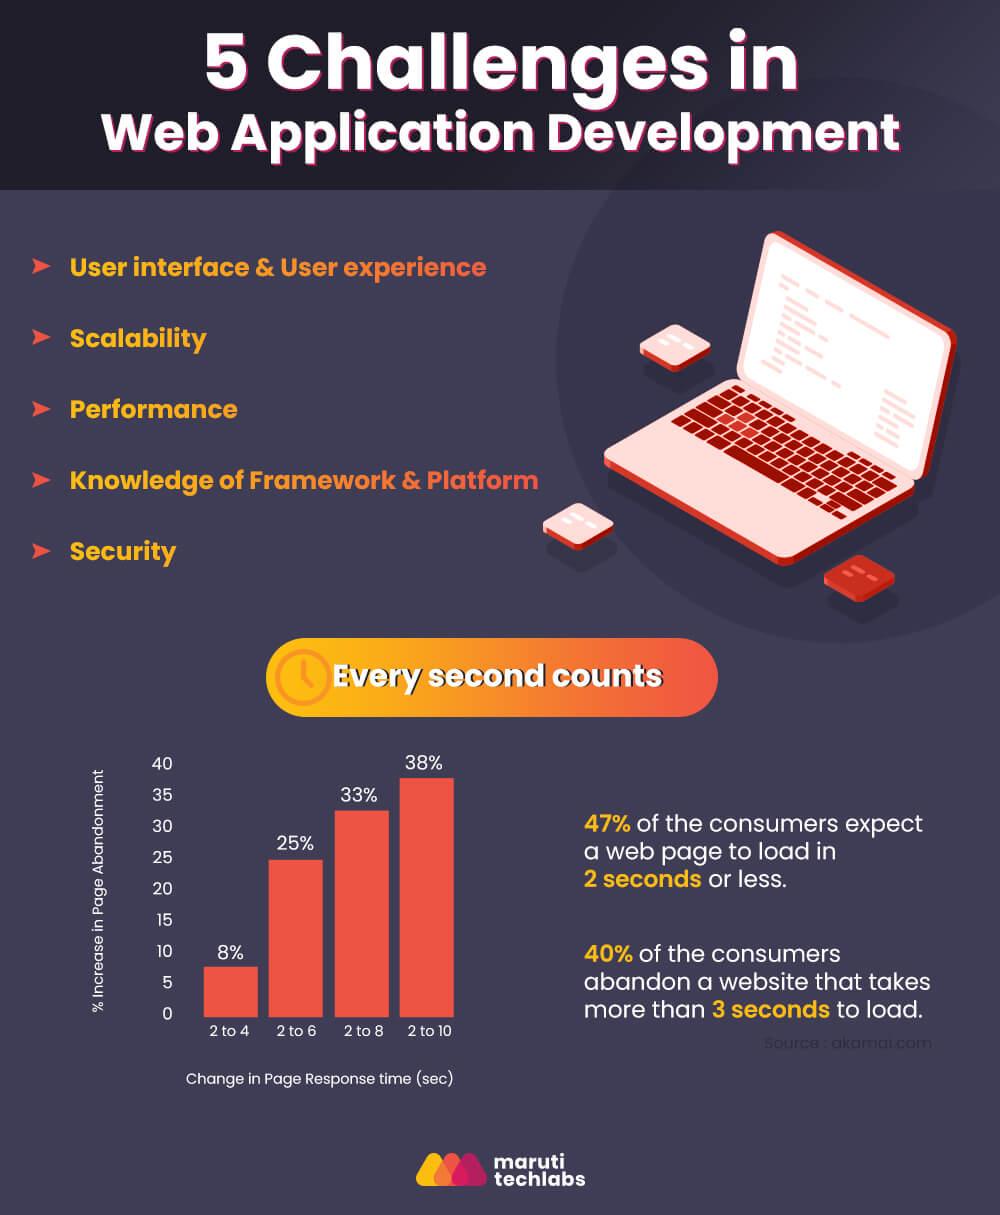 5 Challenges In Web Application Development